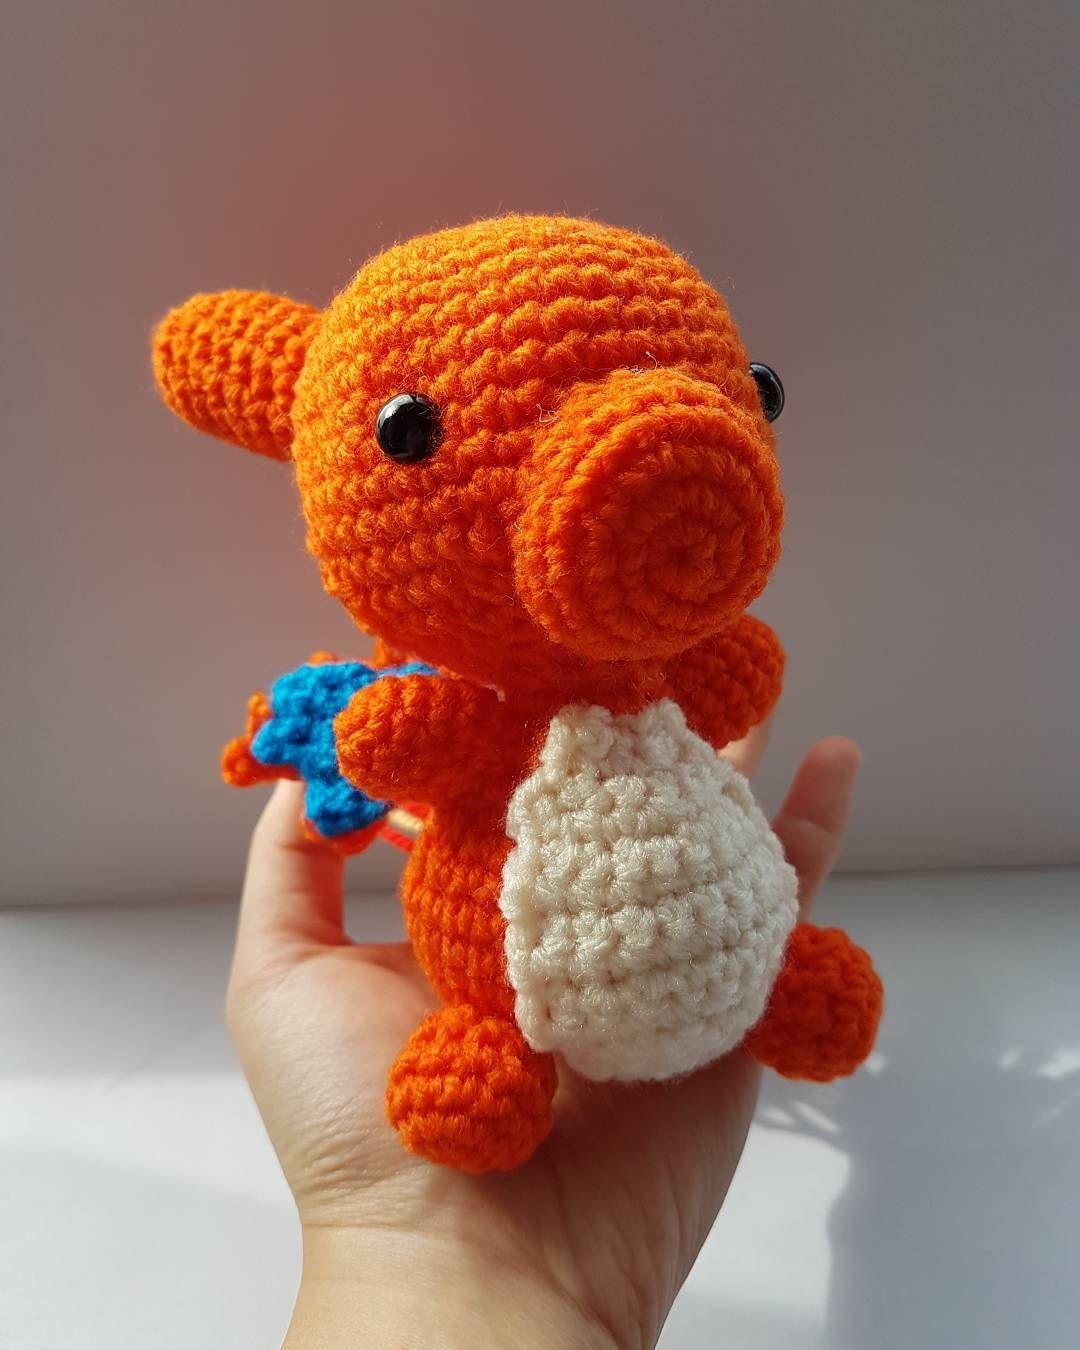 Ta da! Charizard finally complete! He was most enjoyable to make. So cute and squishy!  #charizard #crochet #amigurumi #pokemon #pokemongo #gottacatchemall #complete #collection #handmade #plush #firepokemon #kawaii #nintendo #cuddly #yarn #hobby